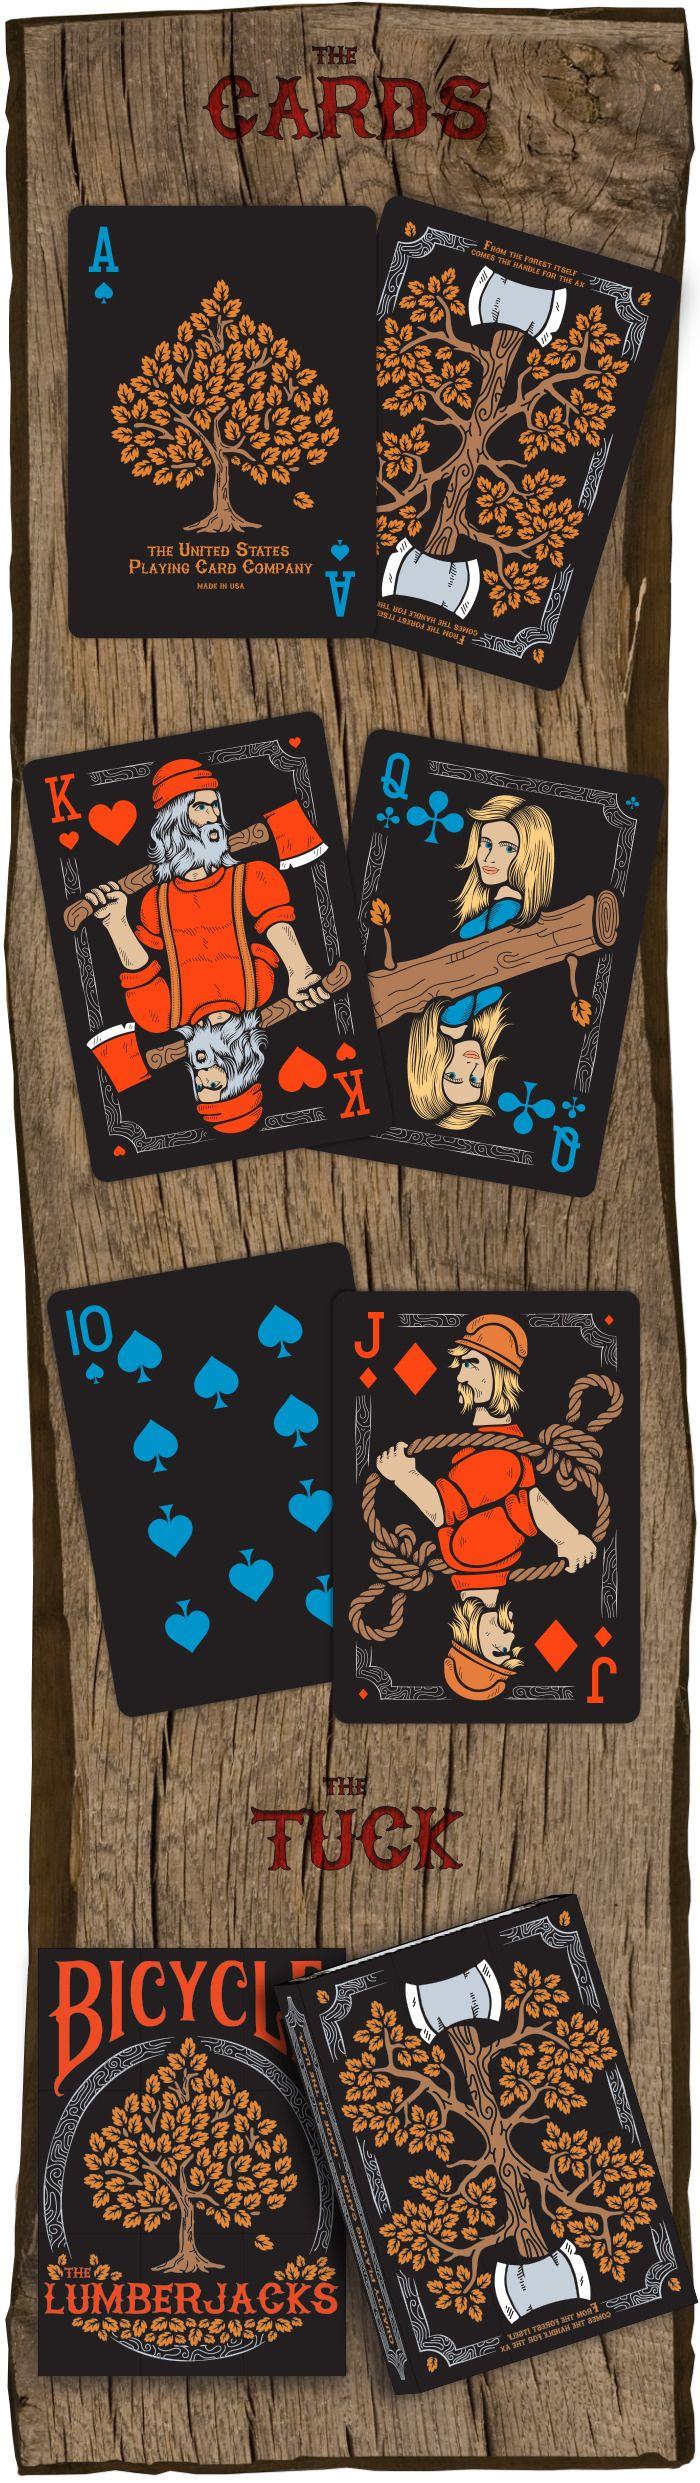 BICYCLE® The Lumberjacks - 2nd Edition Playing Cards by Vadim Smolenskiy — Kickstarter